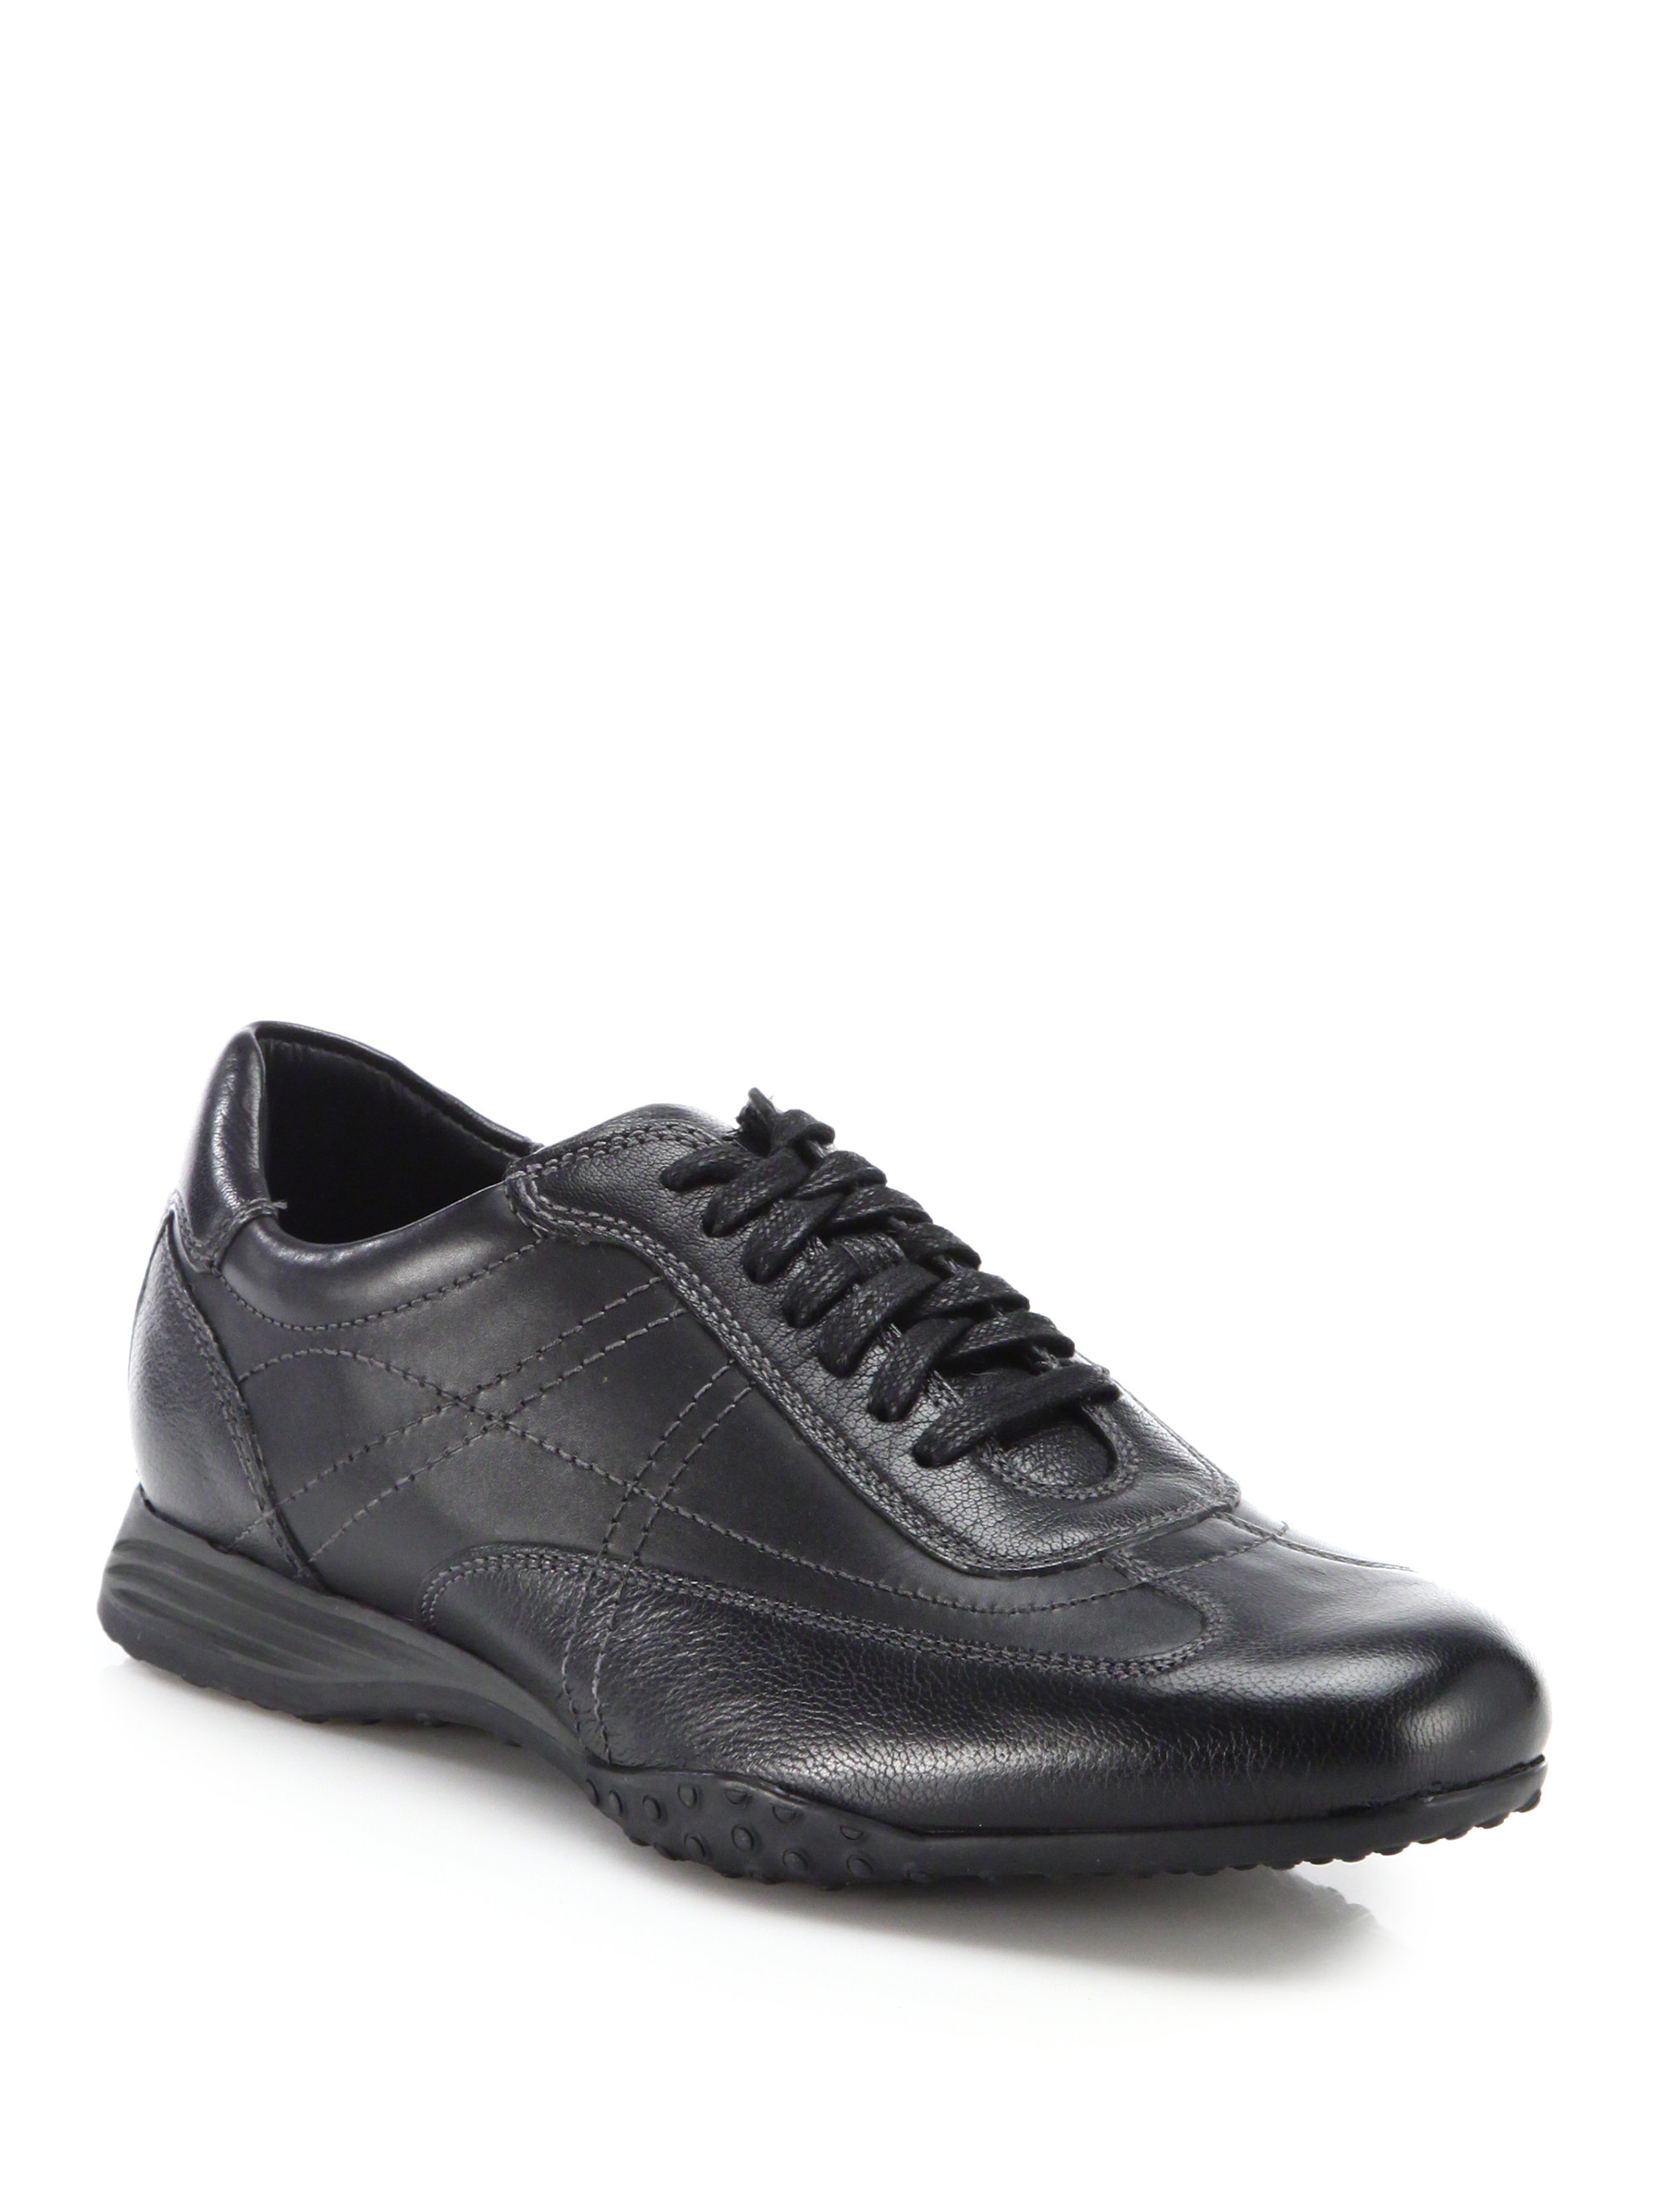 Cole Haan Granada Leather Sneakers In Black For Men Lyst